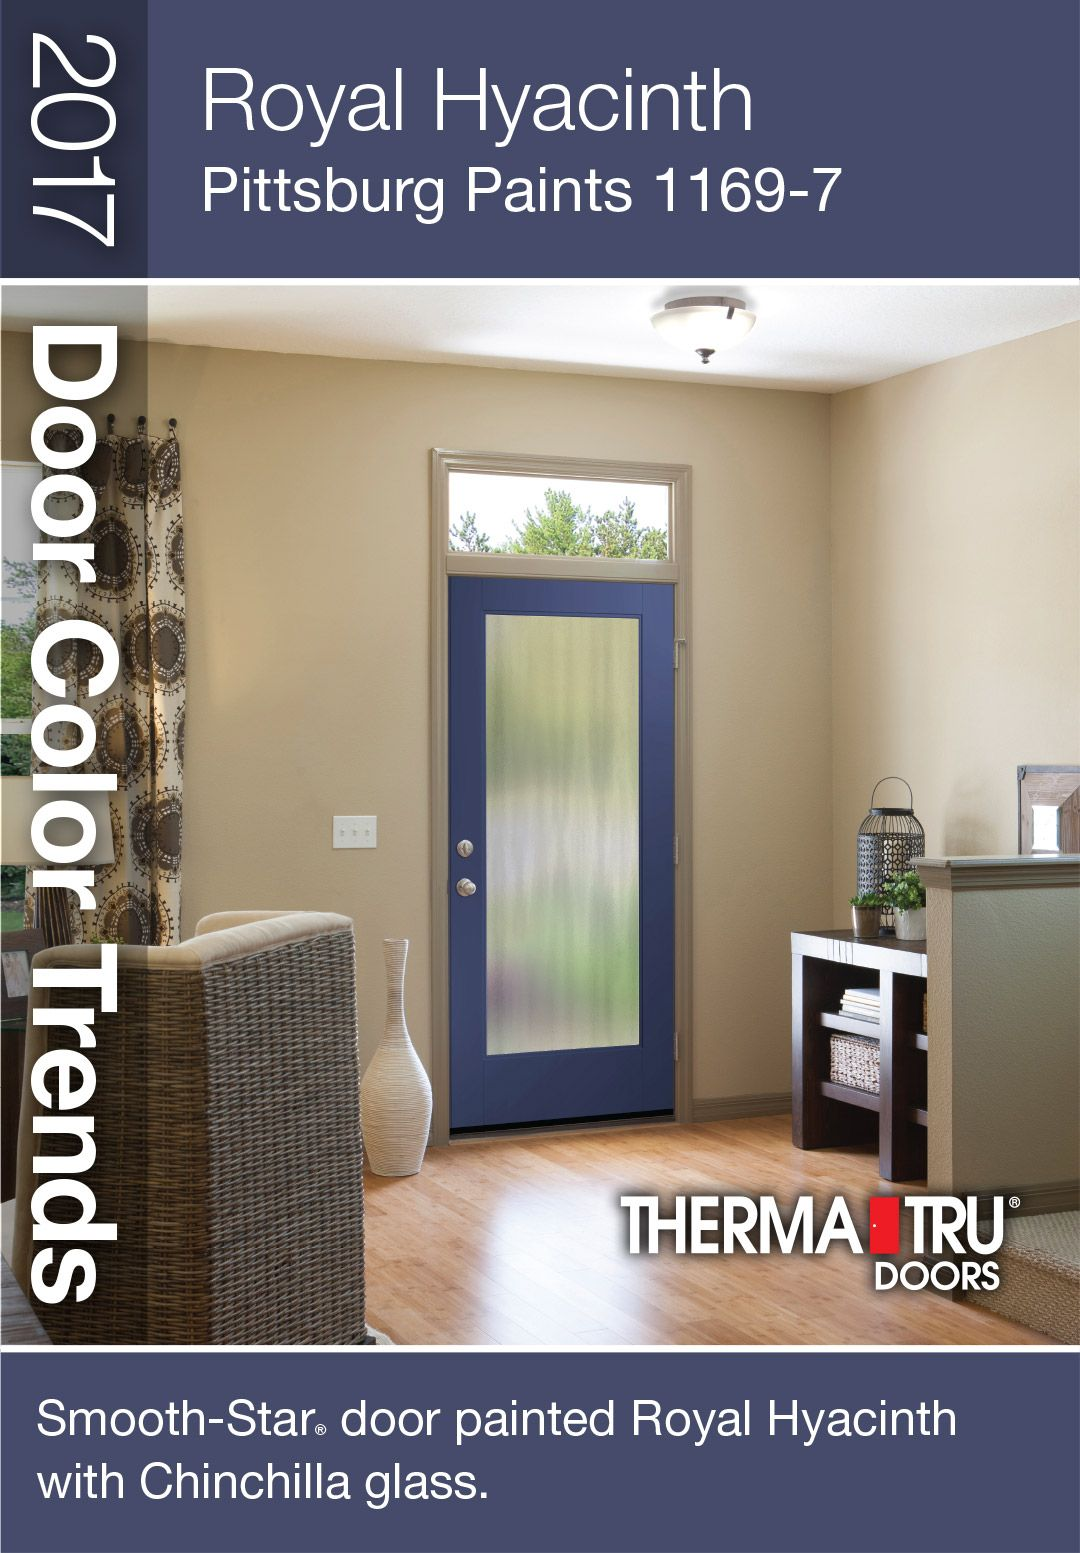 ThermaTru SmoothStar fiberglass door painted Fired Brick with